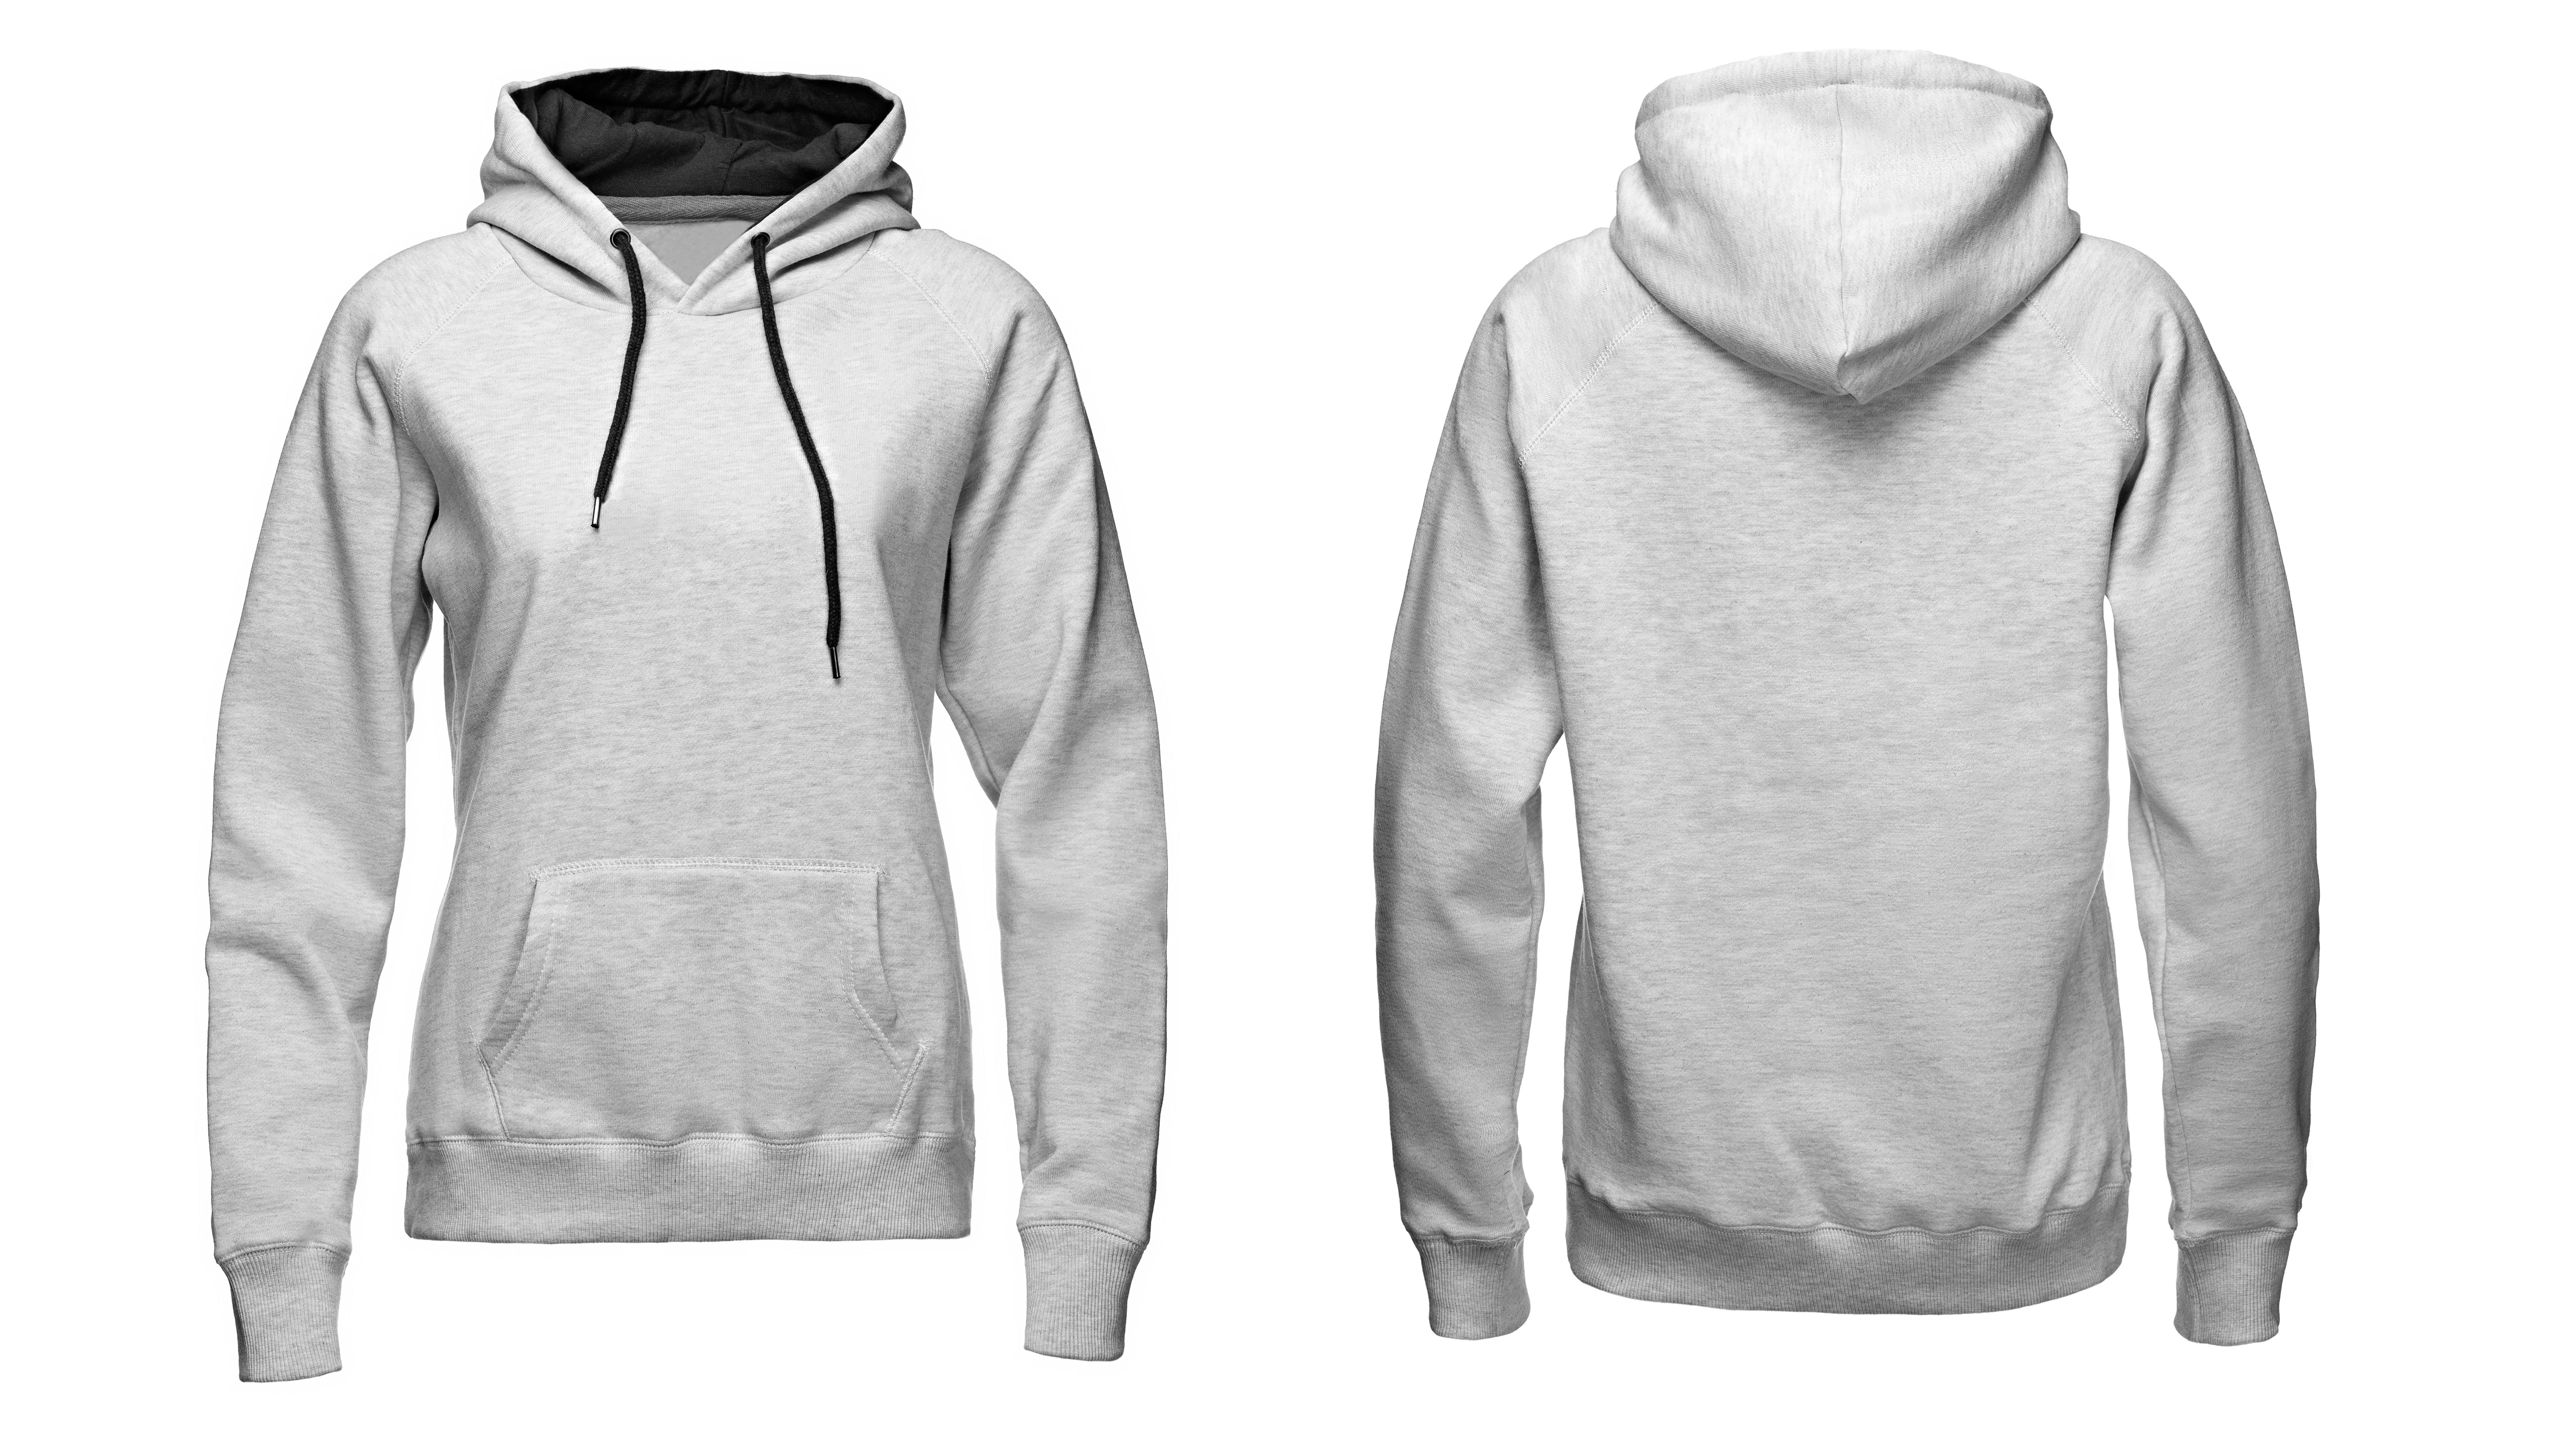 Custom made sweatshirts with hood (8)